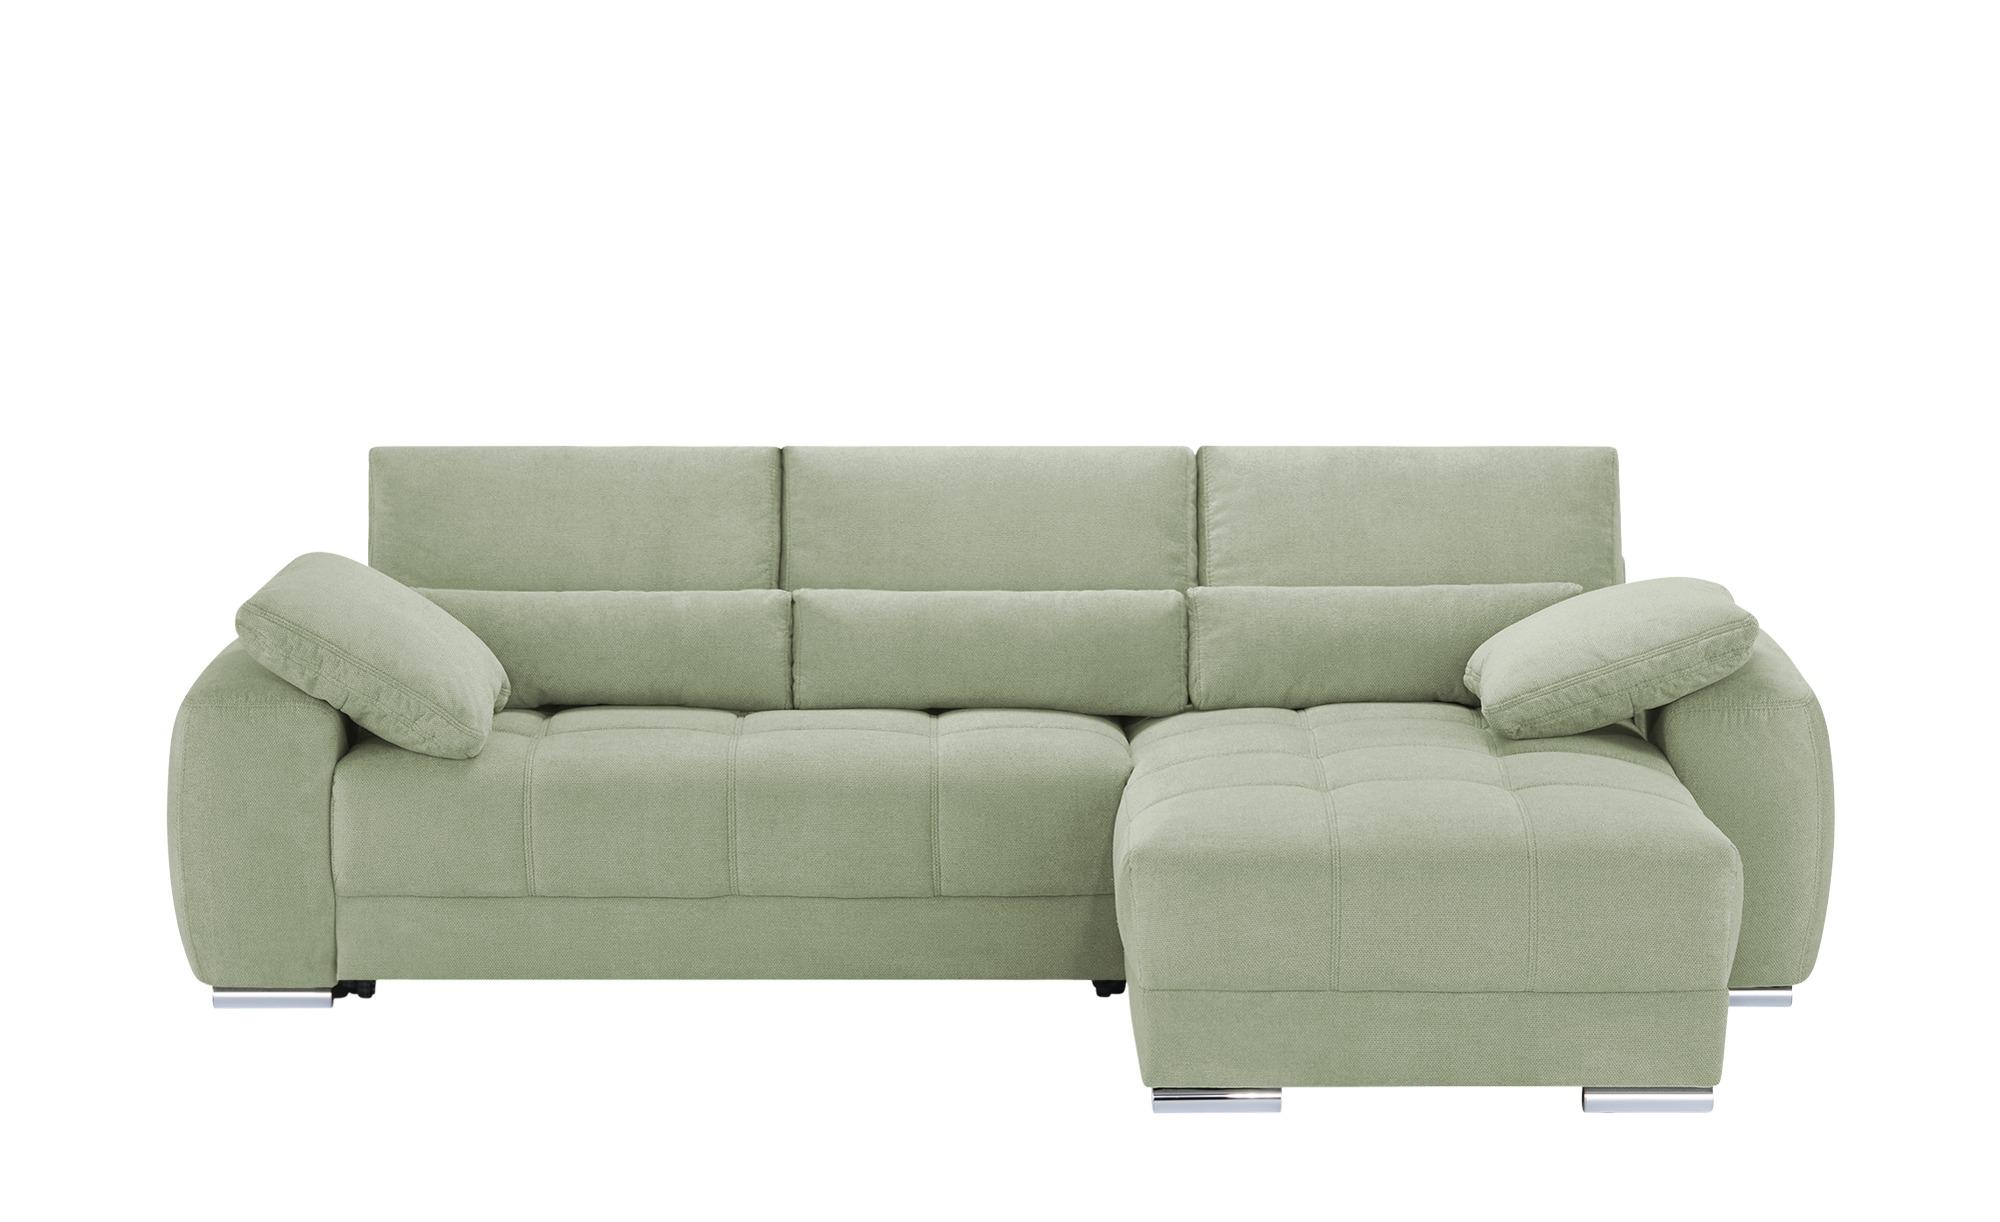 bobb Ecksofa  Fiene ¦ grün ¦ Maße (cm): H: 91 Polstermöbel > Sofas > Ecksofas - Höffner